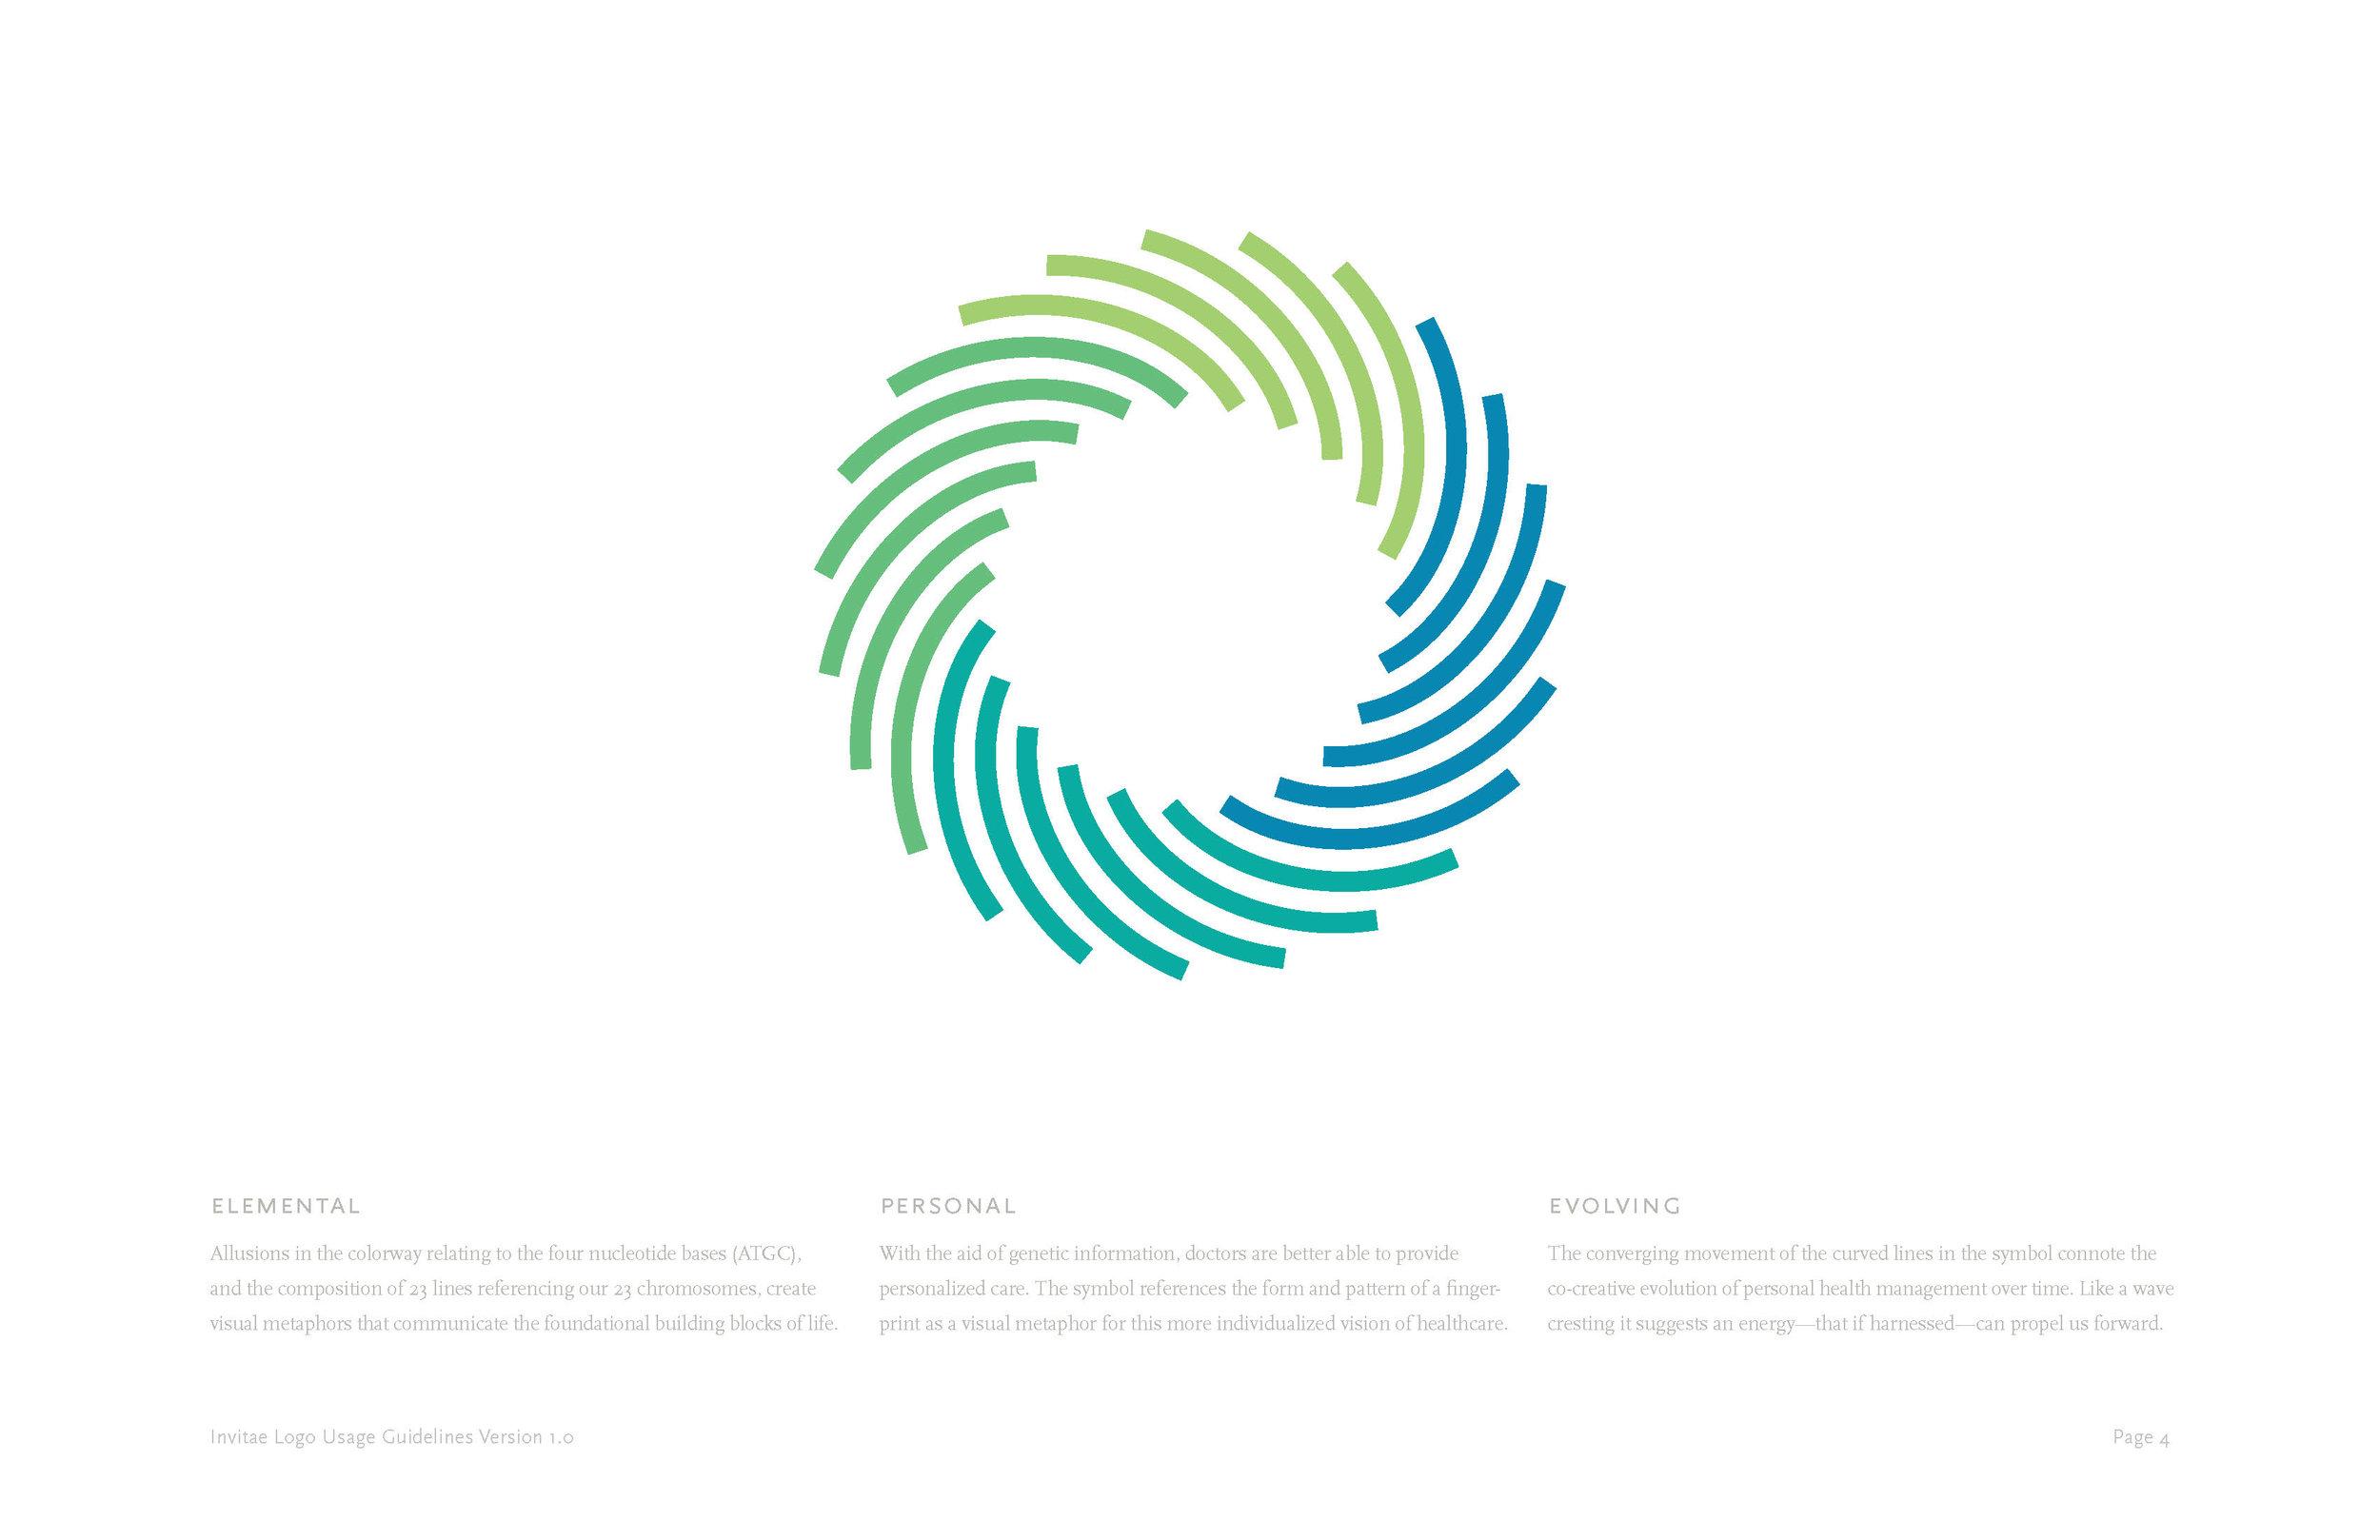 Invitae_logo_guidelines_Page_06.jpg